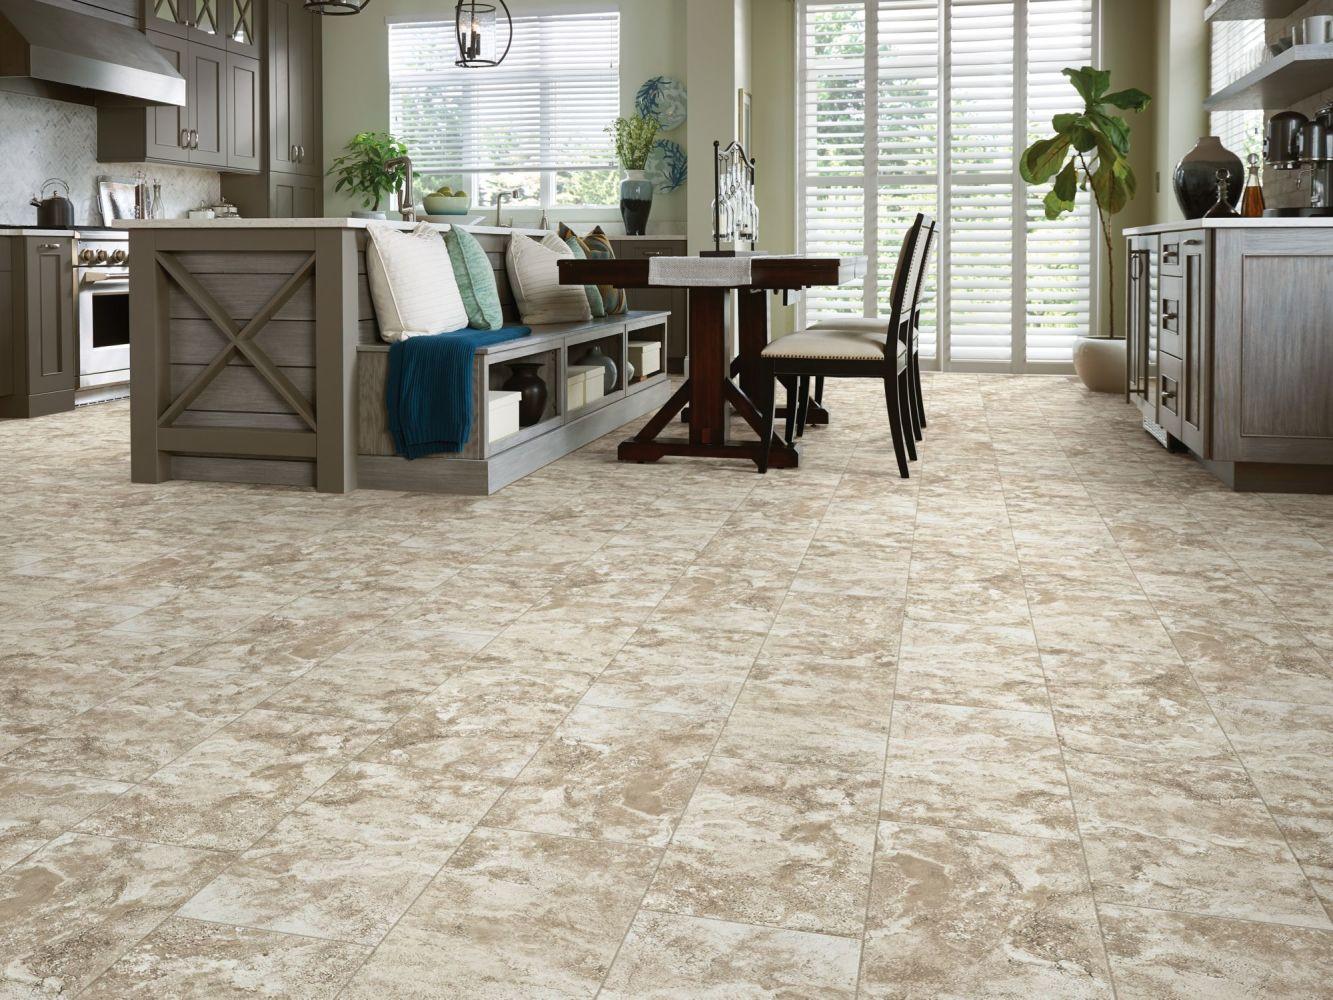 Shaw Floors Home Fn Gold Ceramic Cassio Mosaic Brown 00700_TG10E